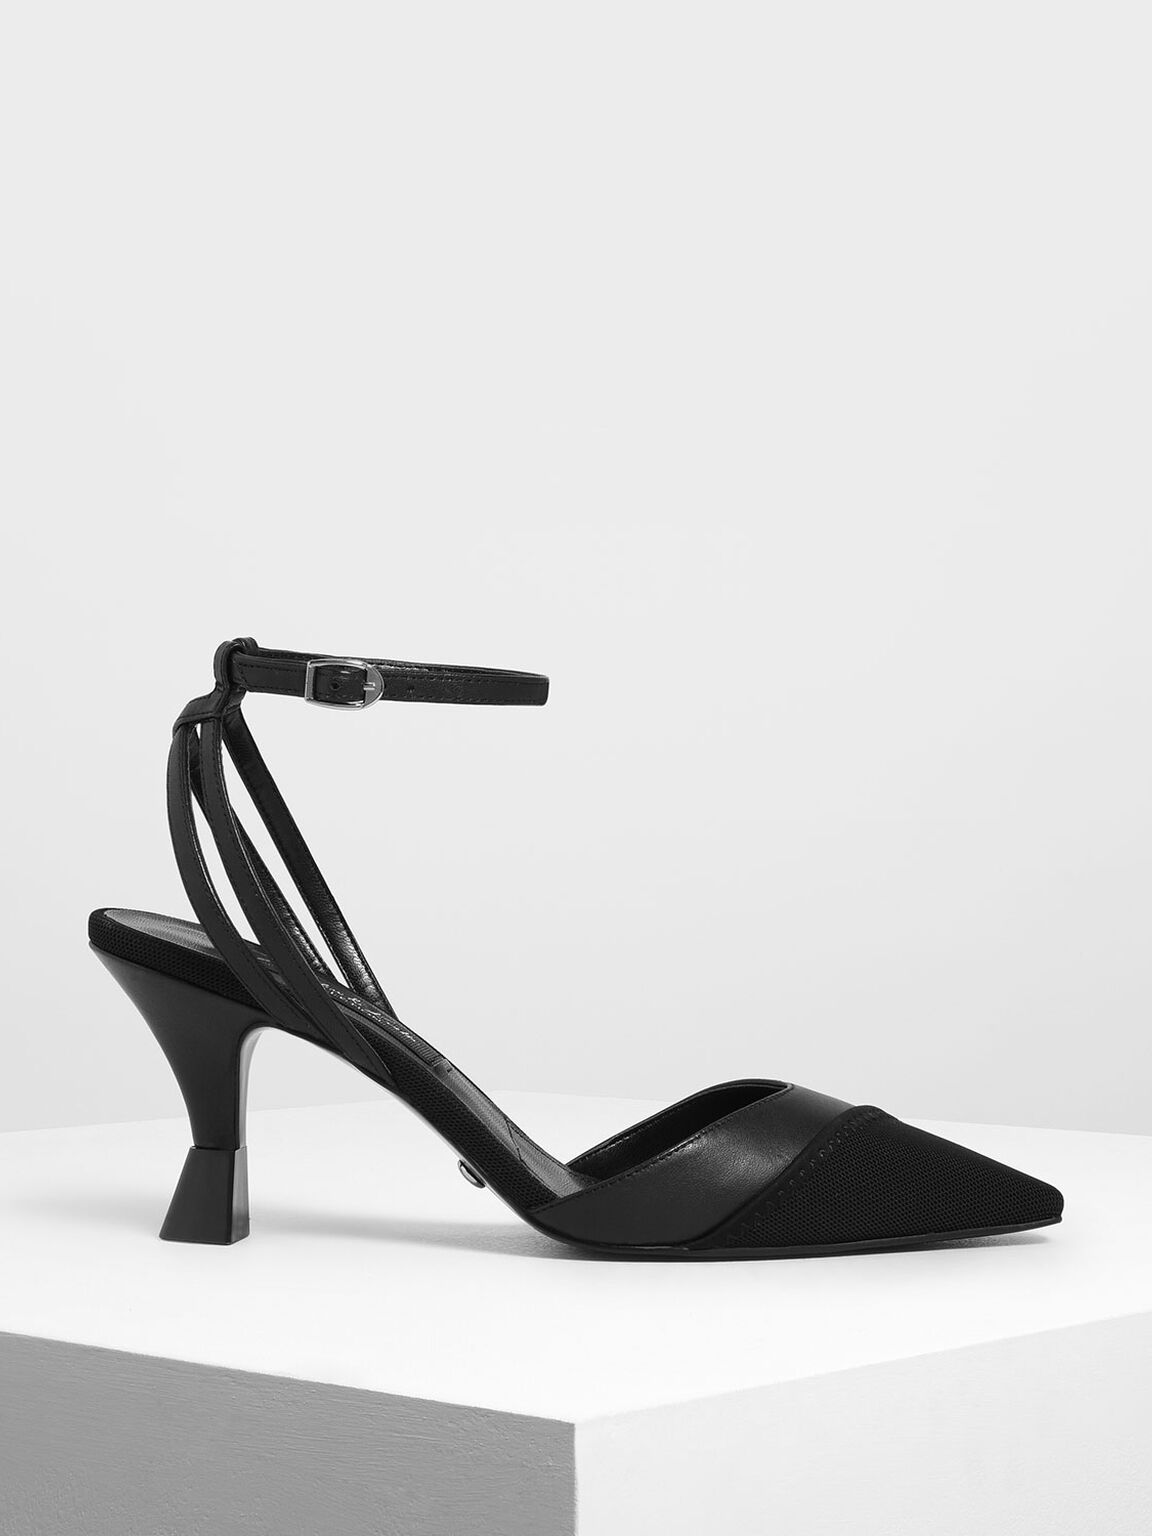 Mesh Leather Ankle Strap Pumps, Black, hi-res